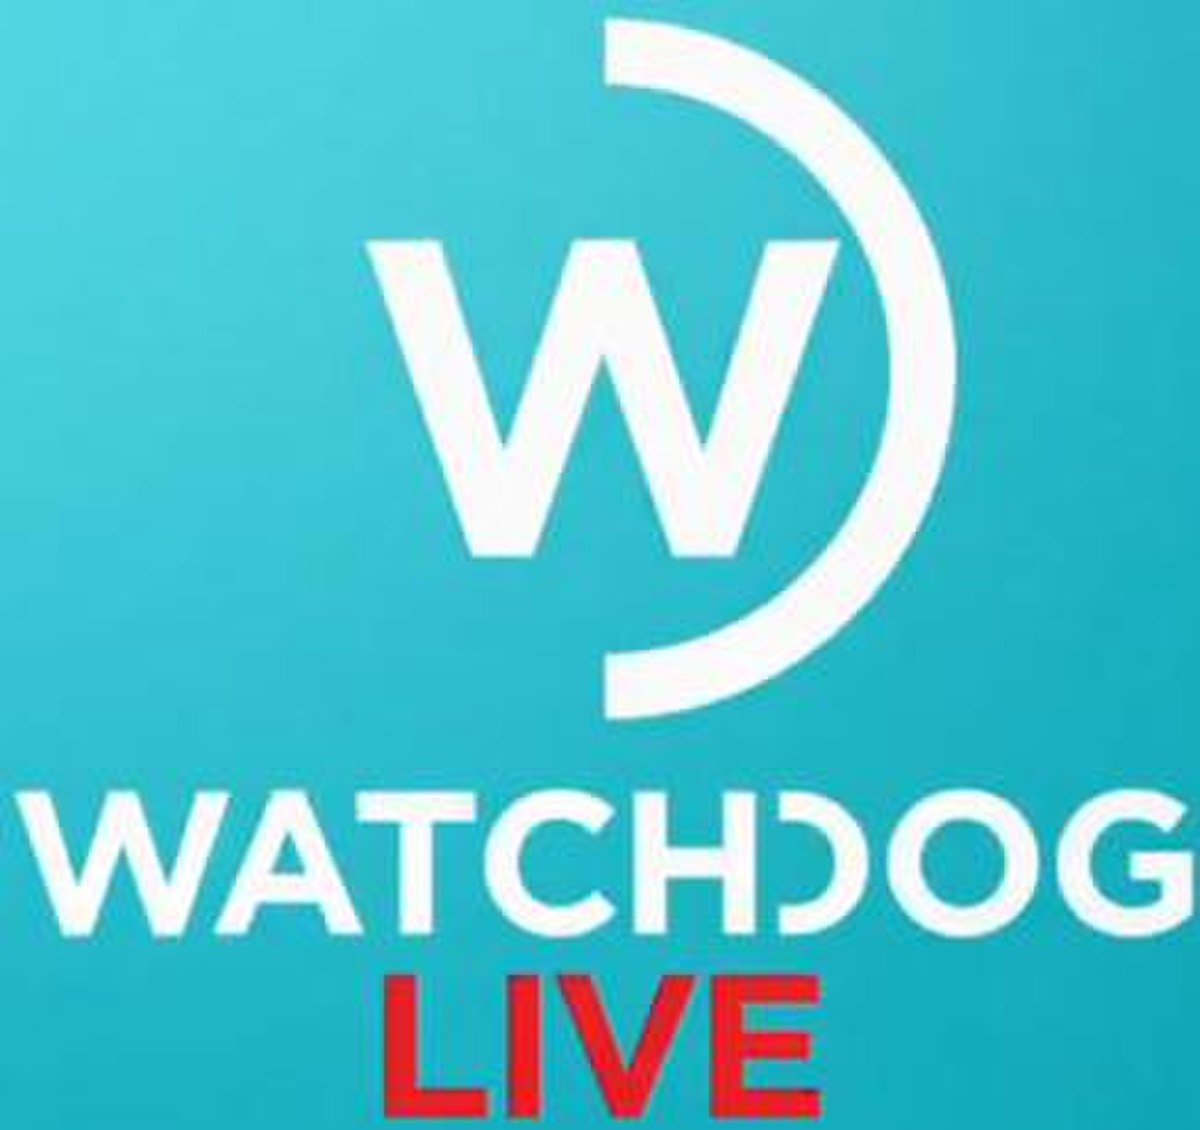 Watchdog Tv Series Wikipedia